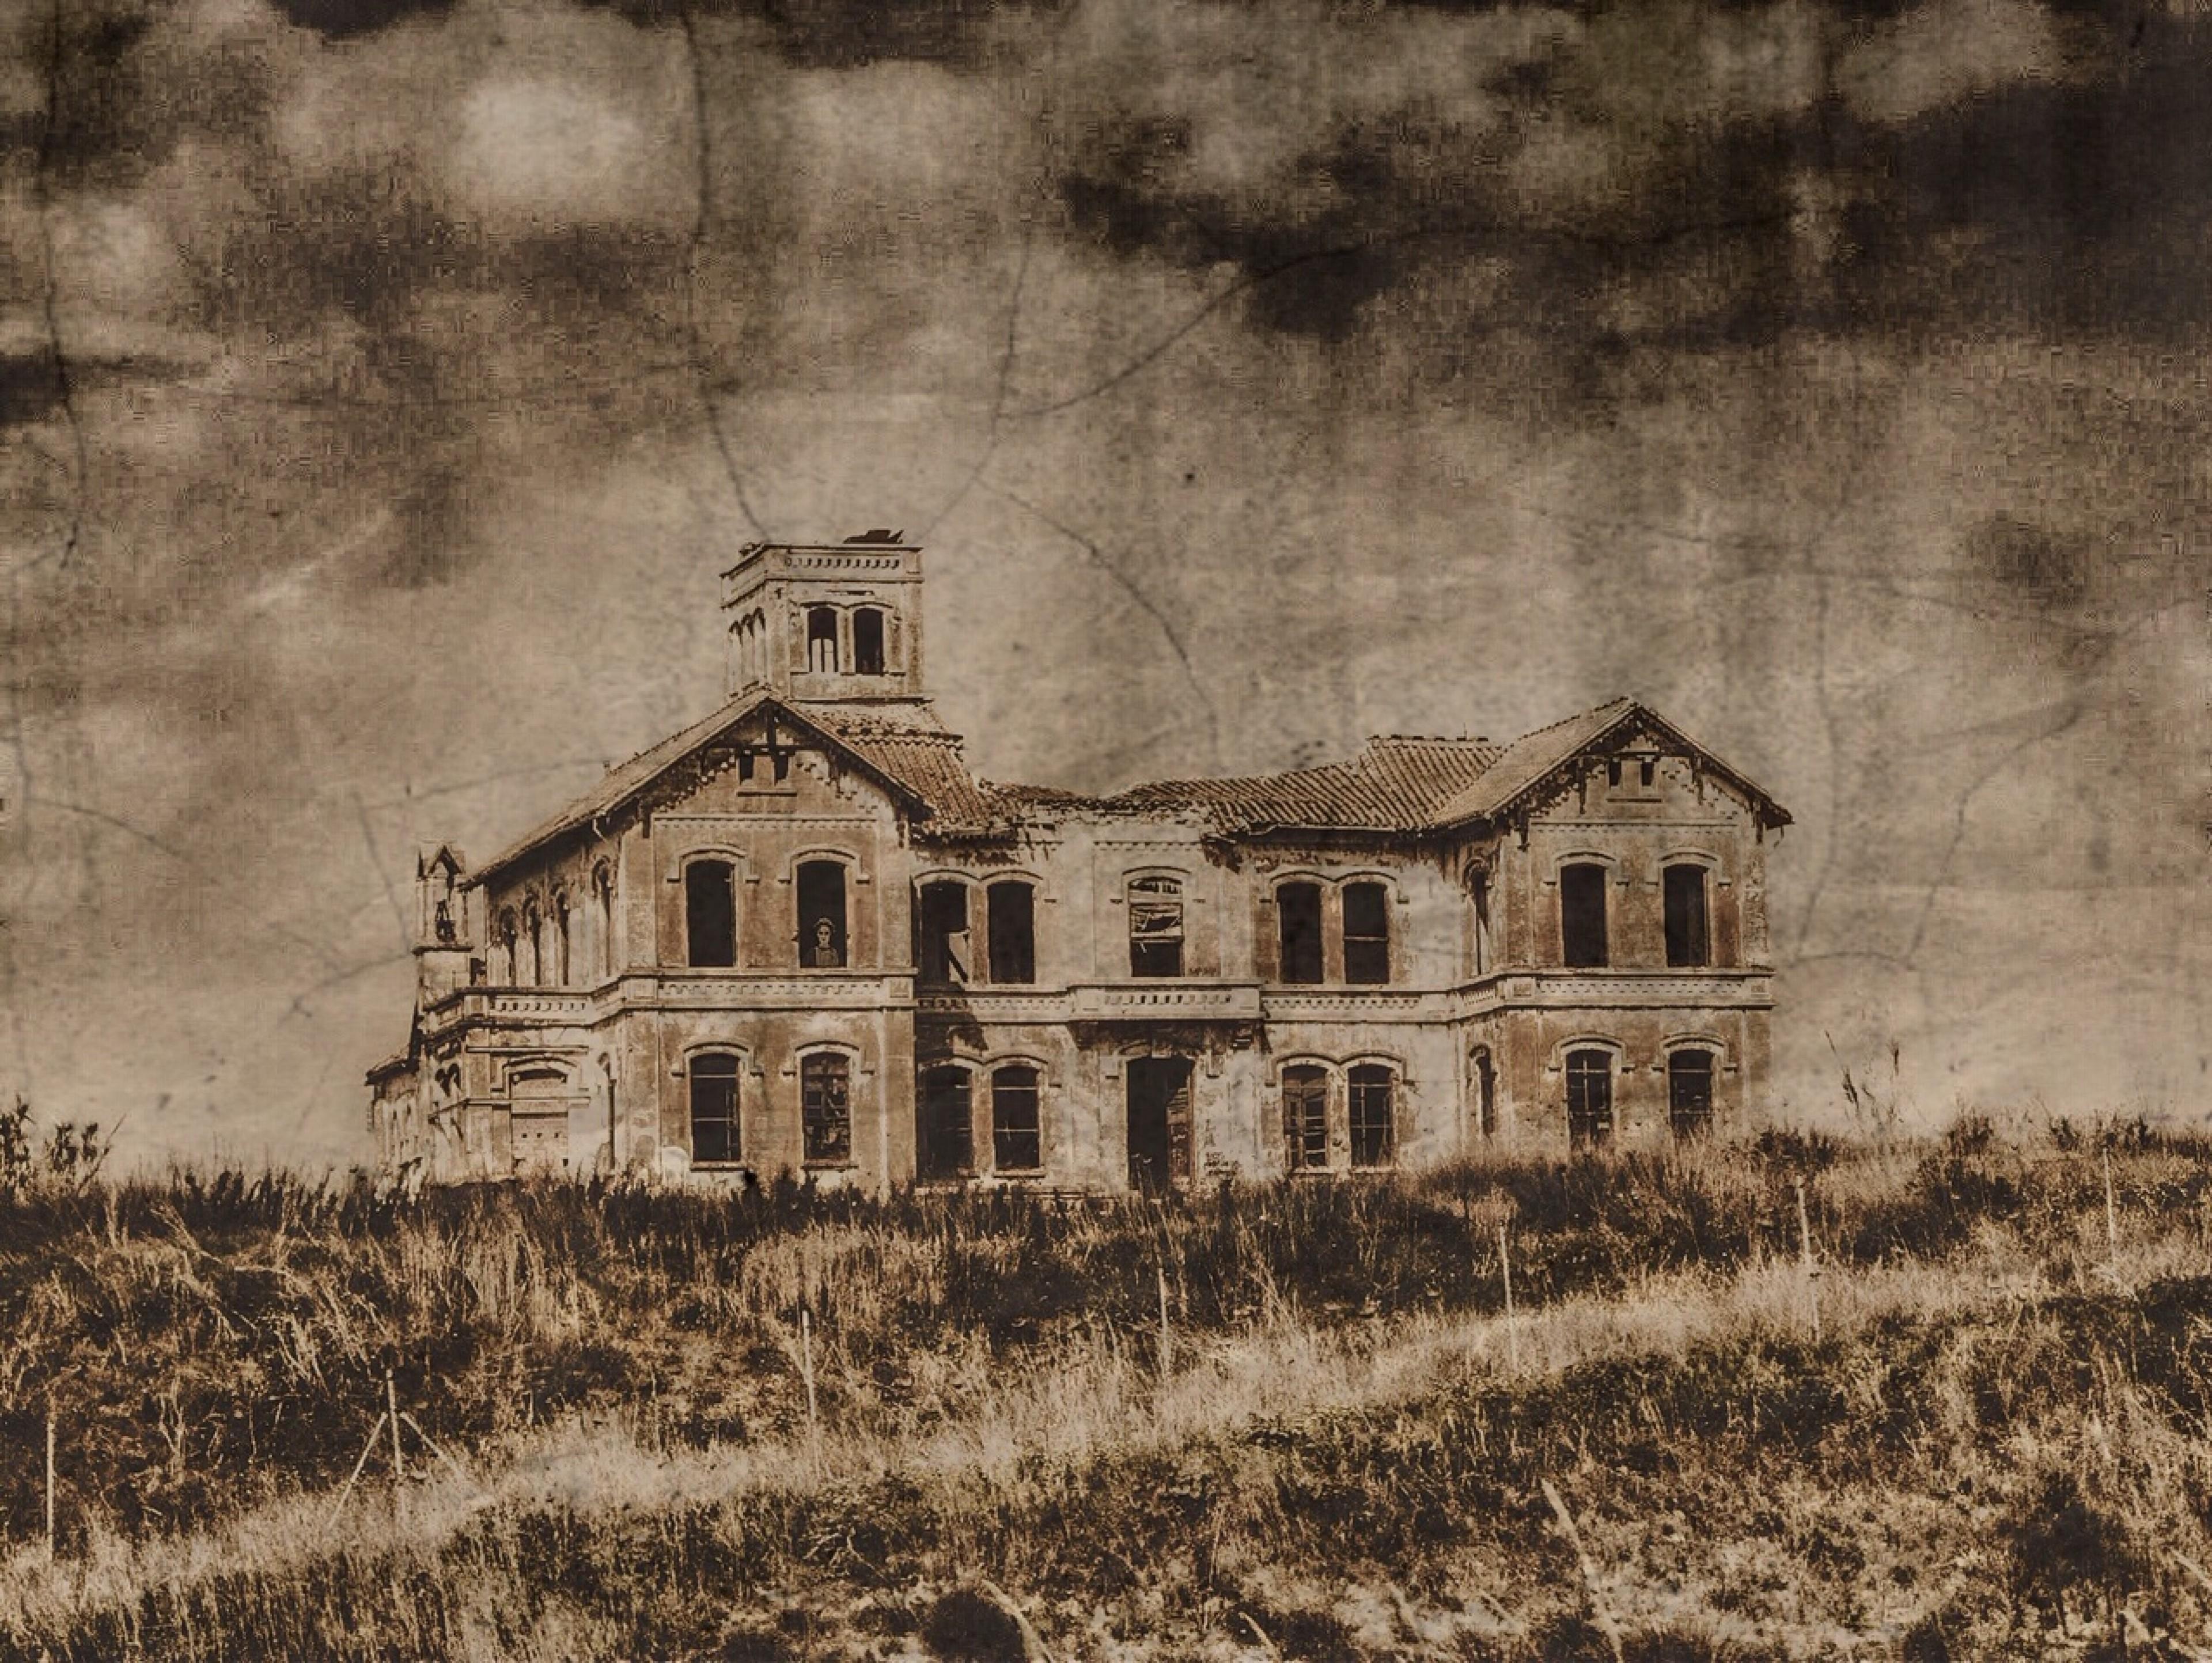 Malaga's Haunted Mansion